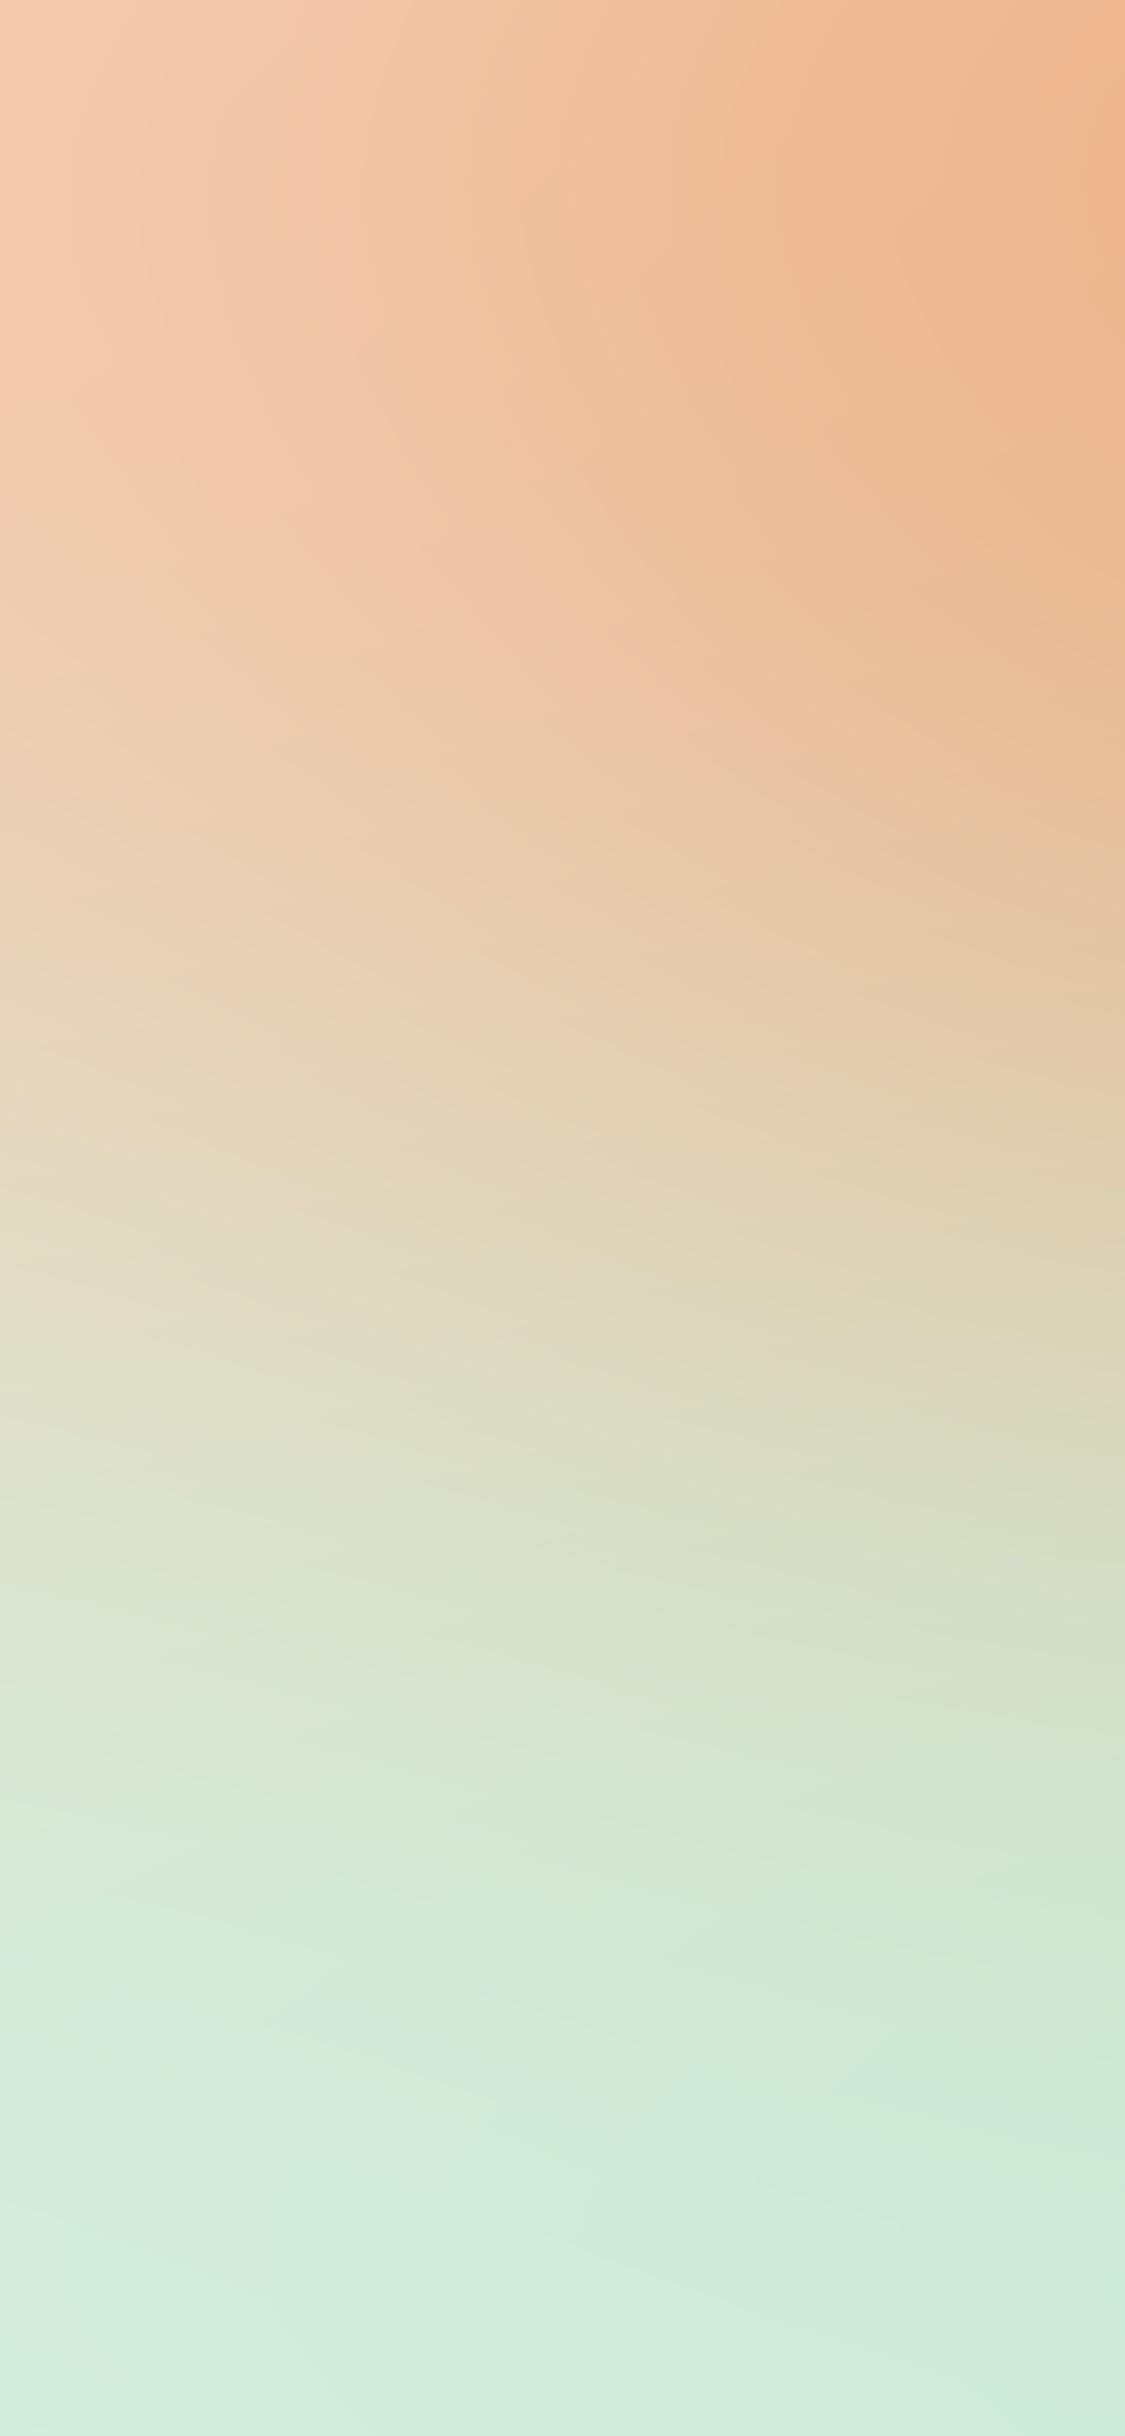 iPhonexpapers.com-Apple-iPhone-wallpaper-sn24-orange-pastel-blur-gradation